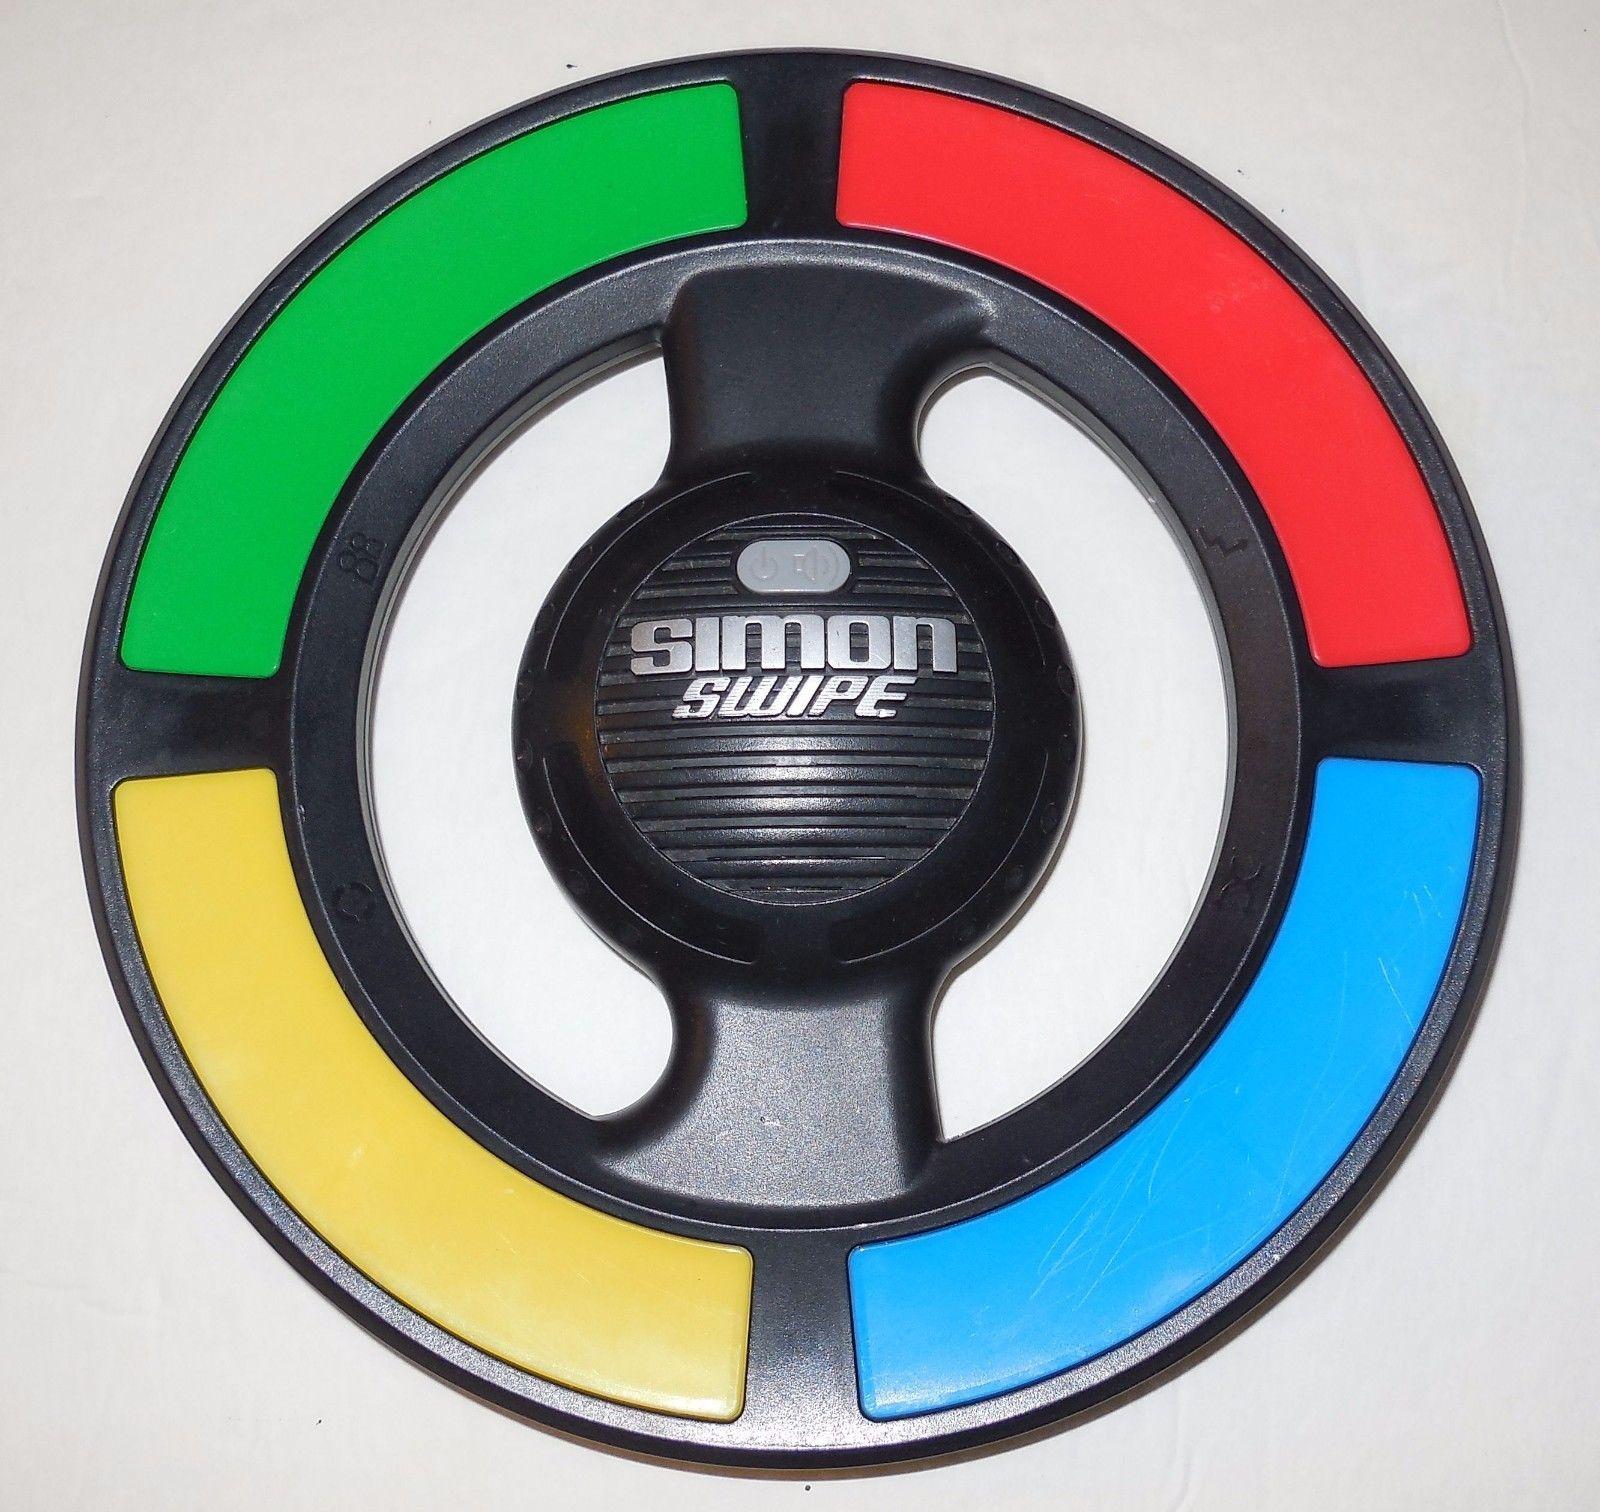 2013 Simon Swipe Full Size Electronic Game Milton Bradley Hasbro - $14.03